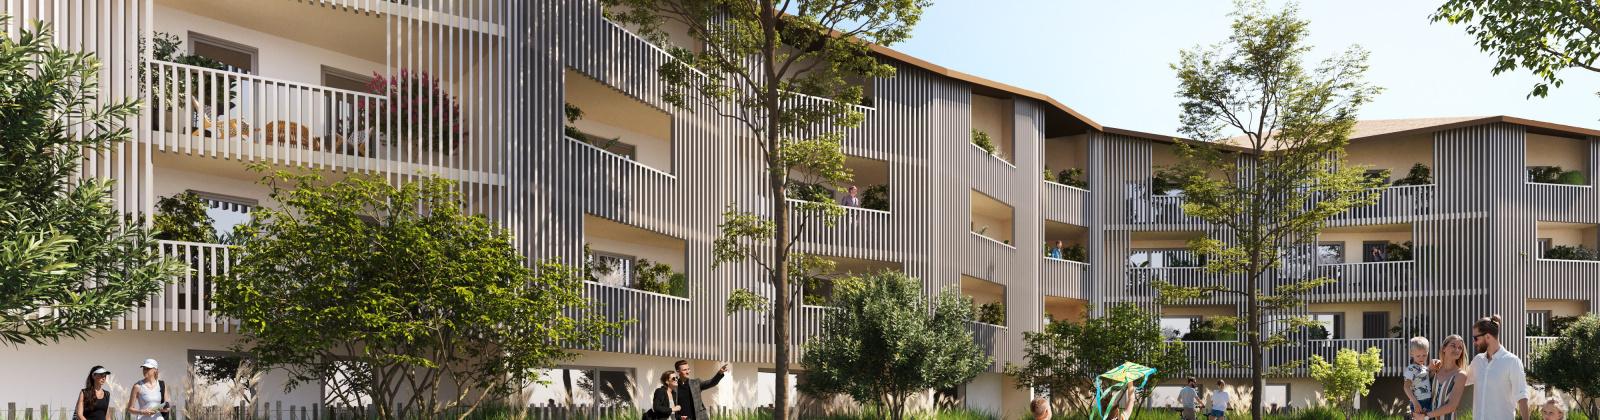 CARREROT, PAU, France 64000, 1 Chambre Chambres, ,1 Salle de bainsSalle de bain,Appartement,Appartement,CARREROT,2,1368